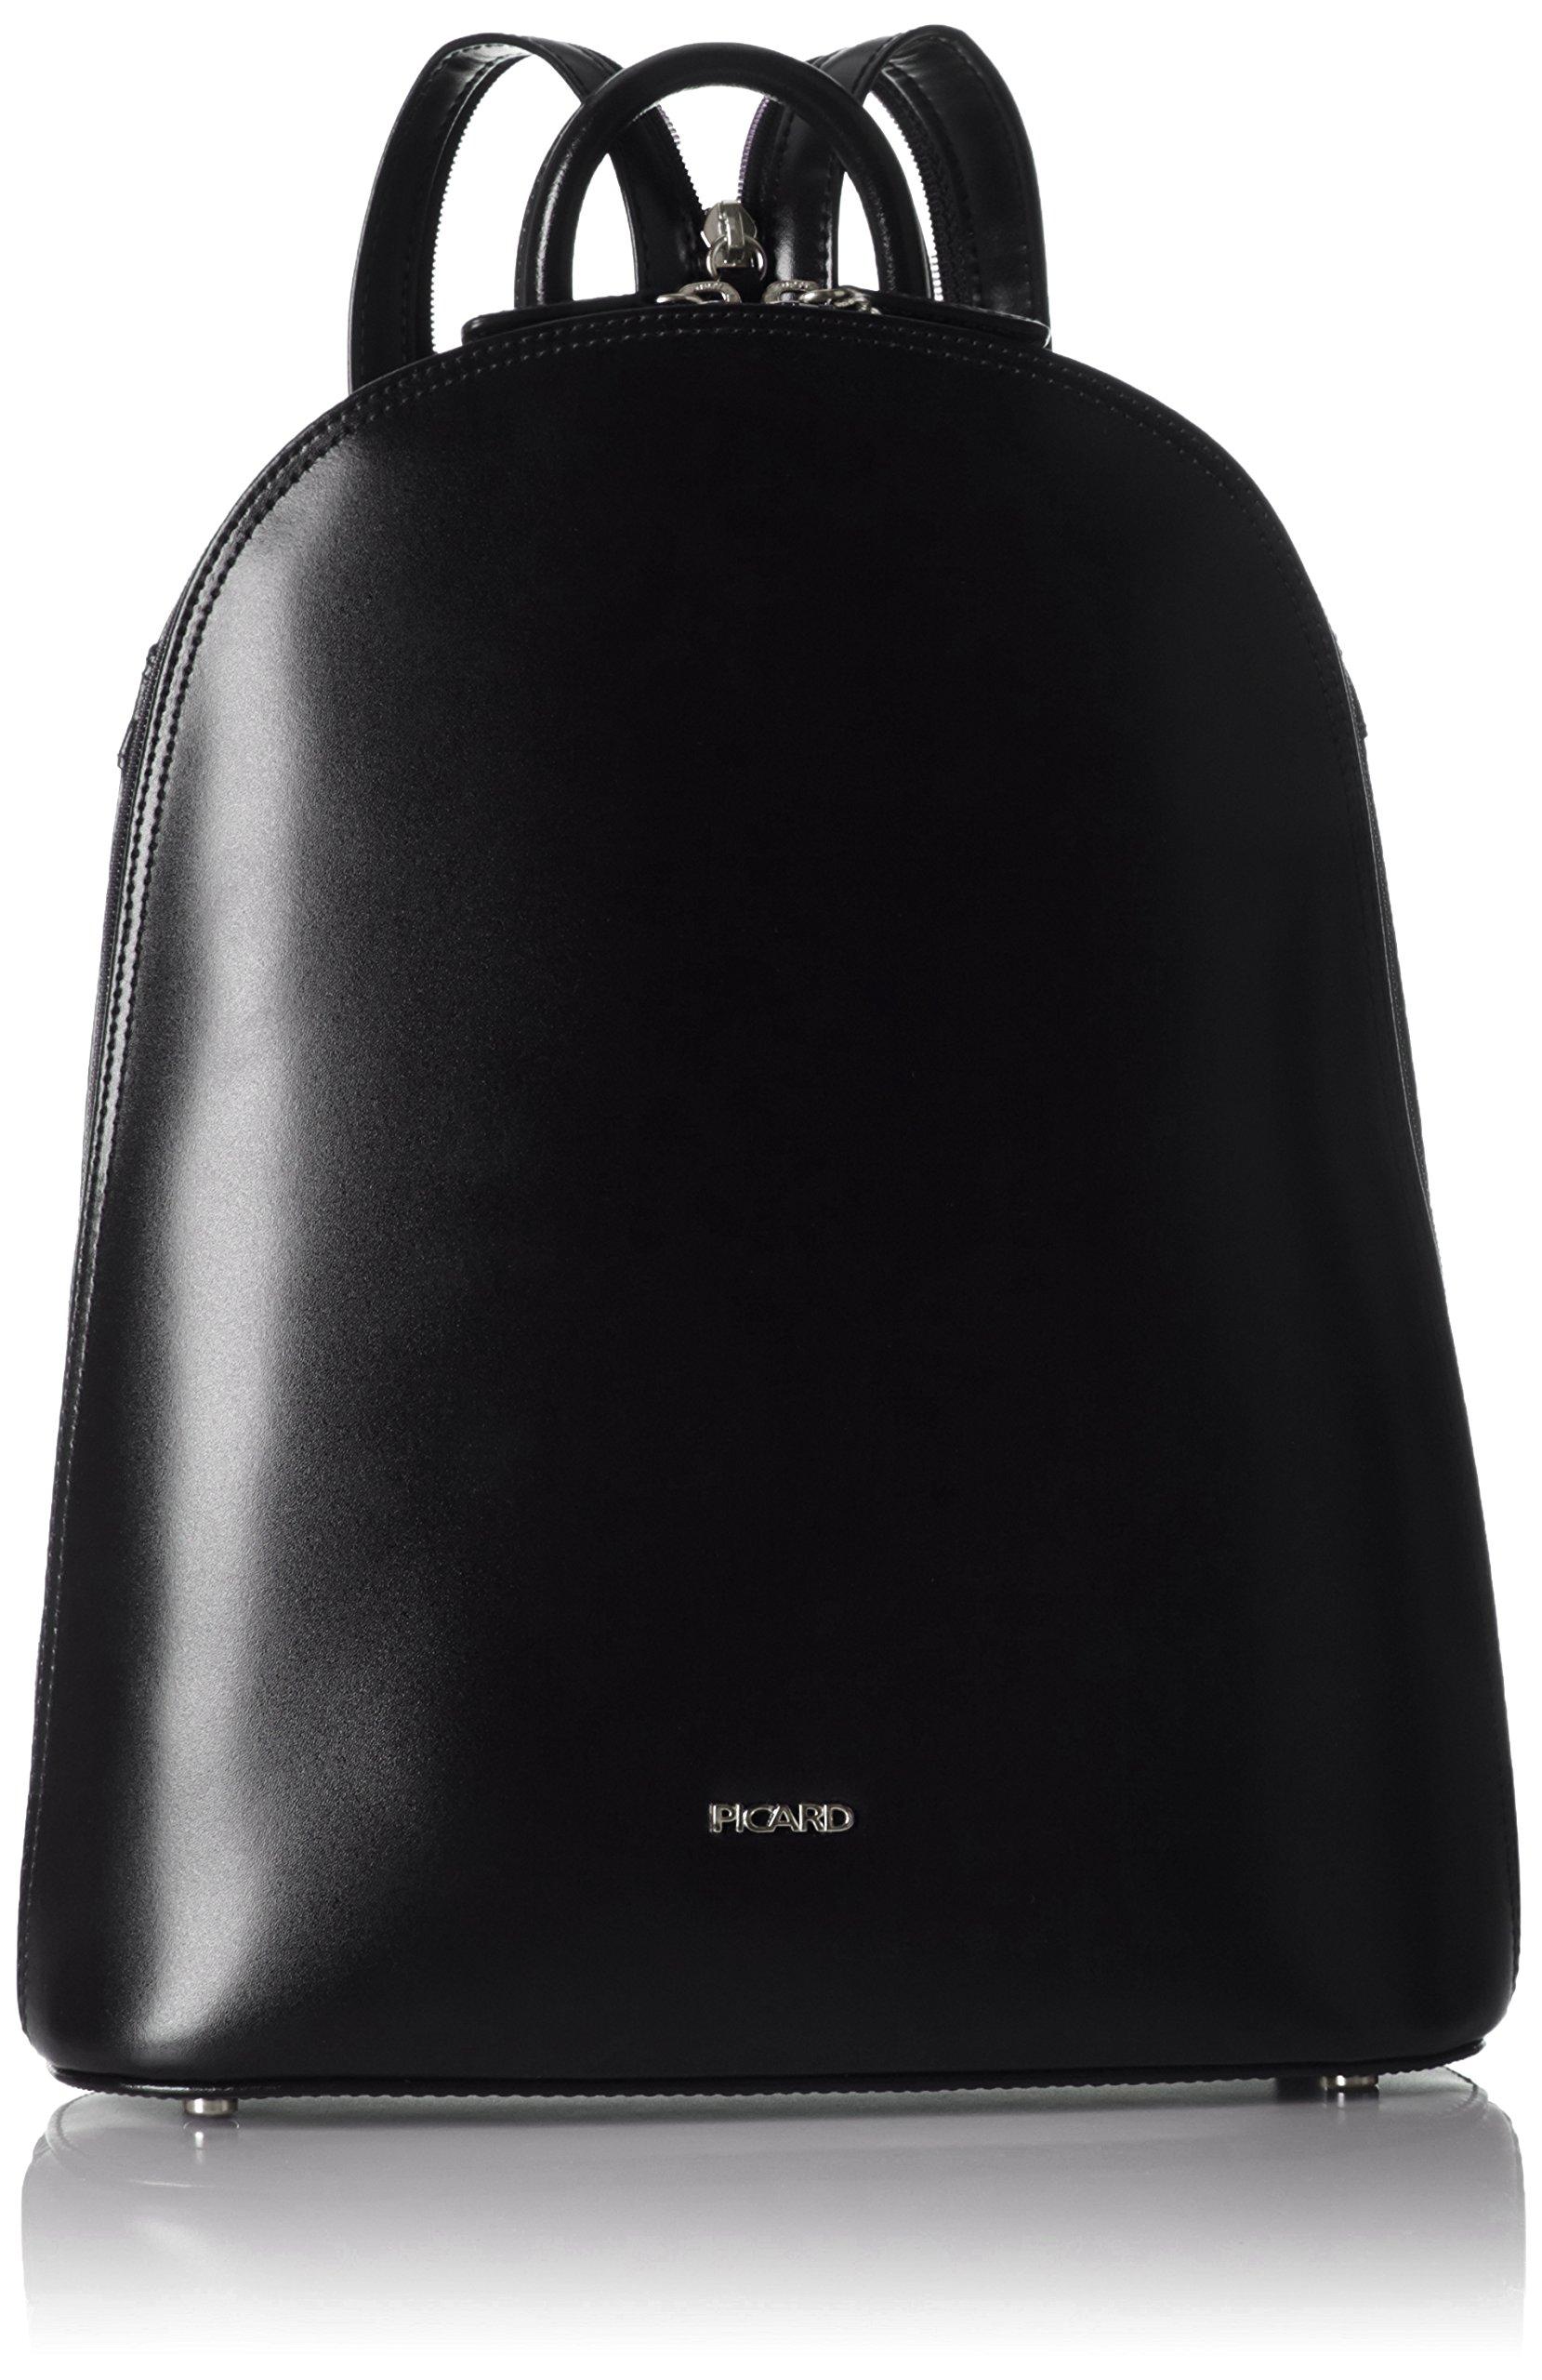 Picard Berlin, Mochila para Mujer, Negro (Black), 10x31x25 cm (W x H x L)